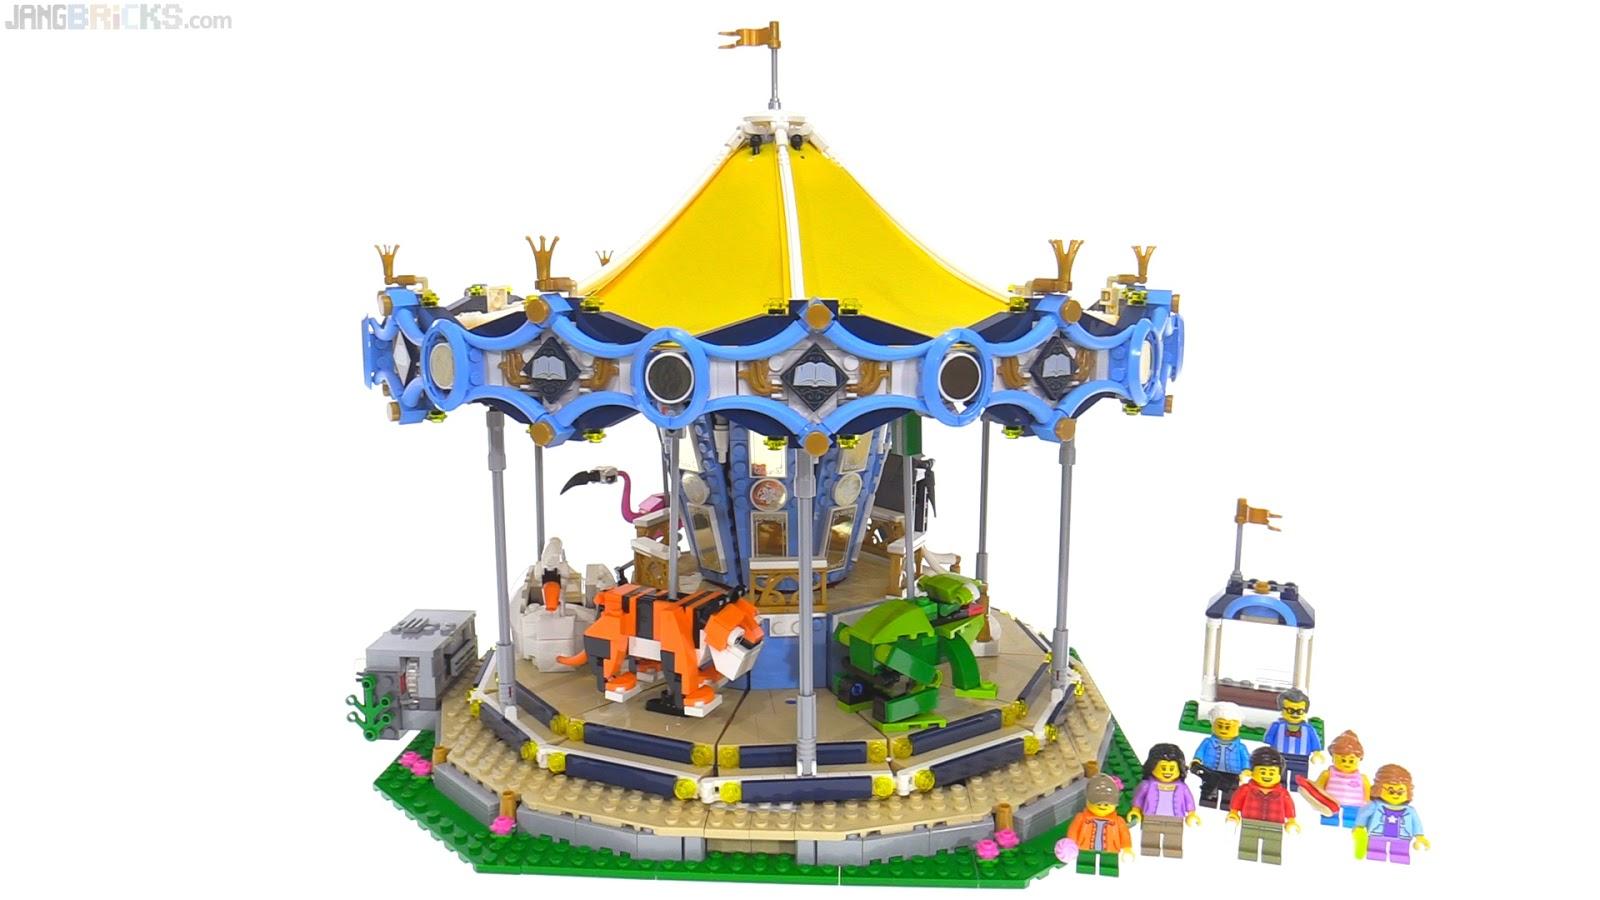 LEGO Creator 2017 Carousel build & review videos 10257